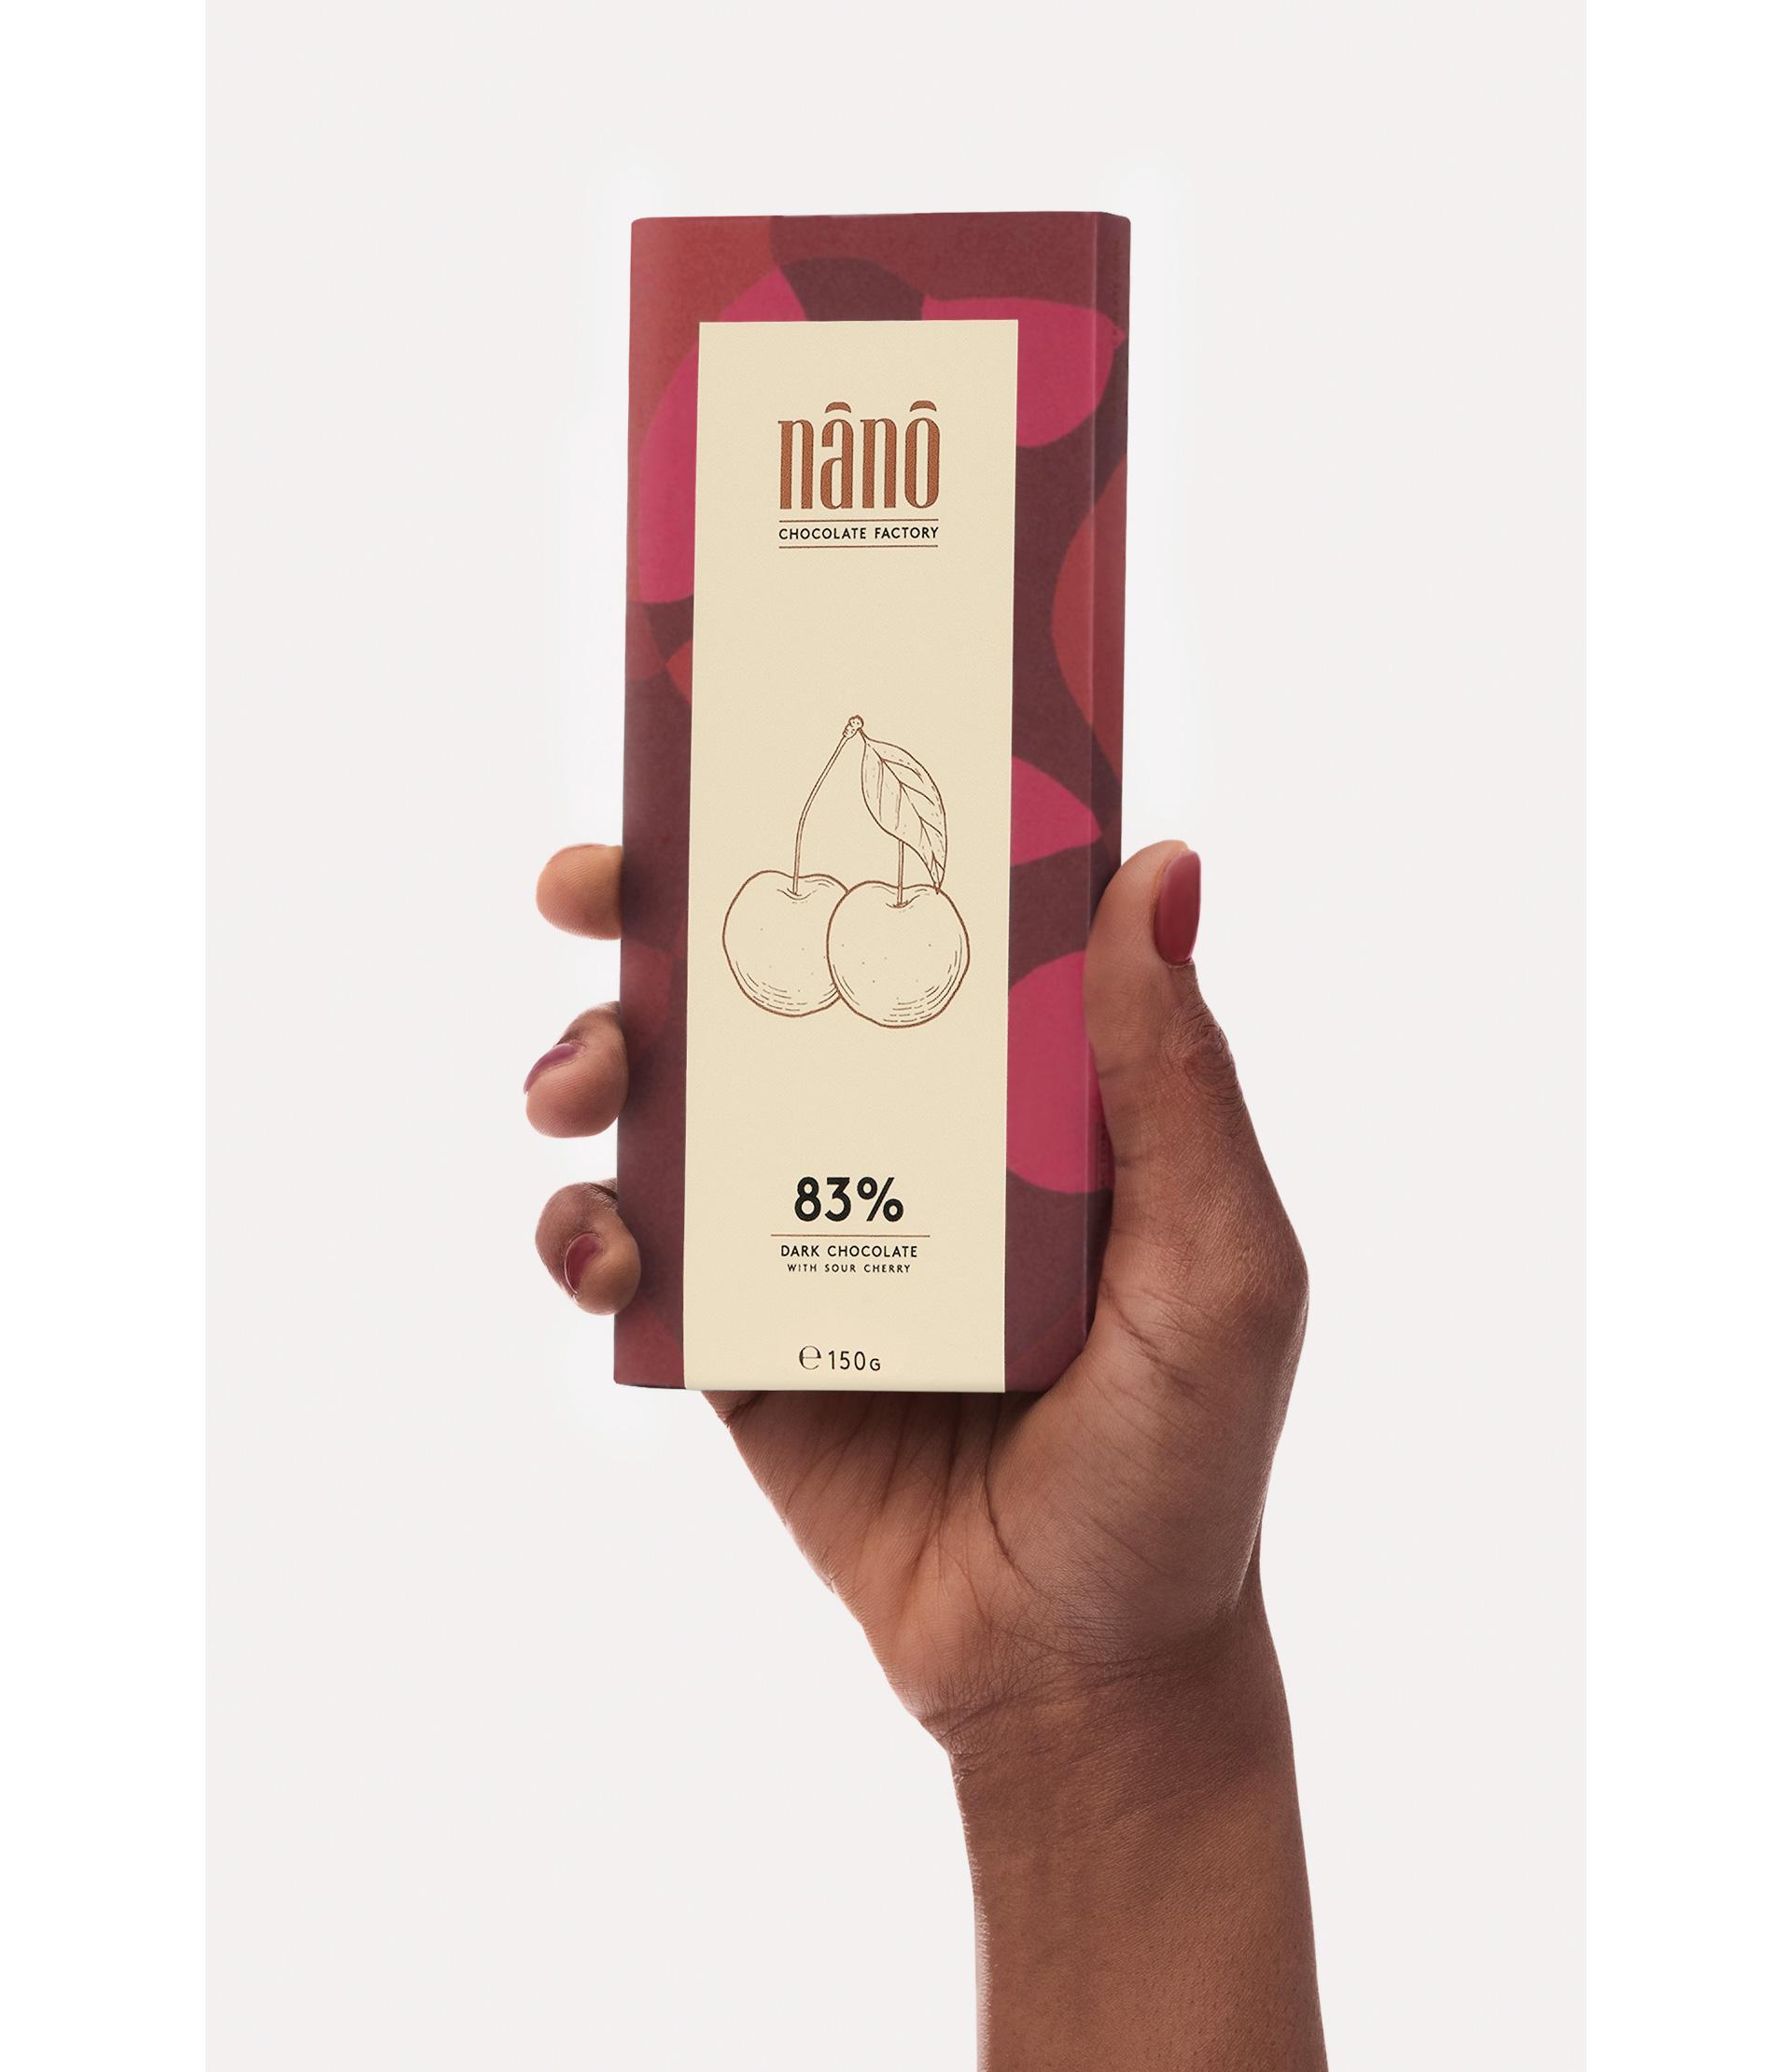 Nano branding